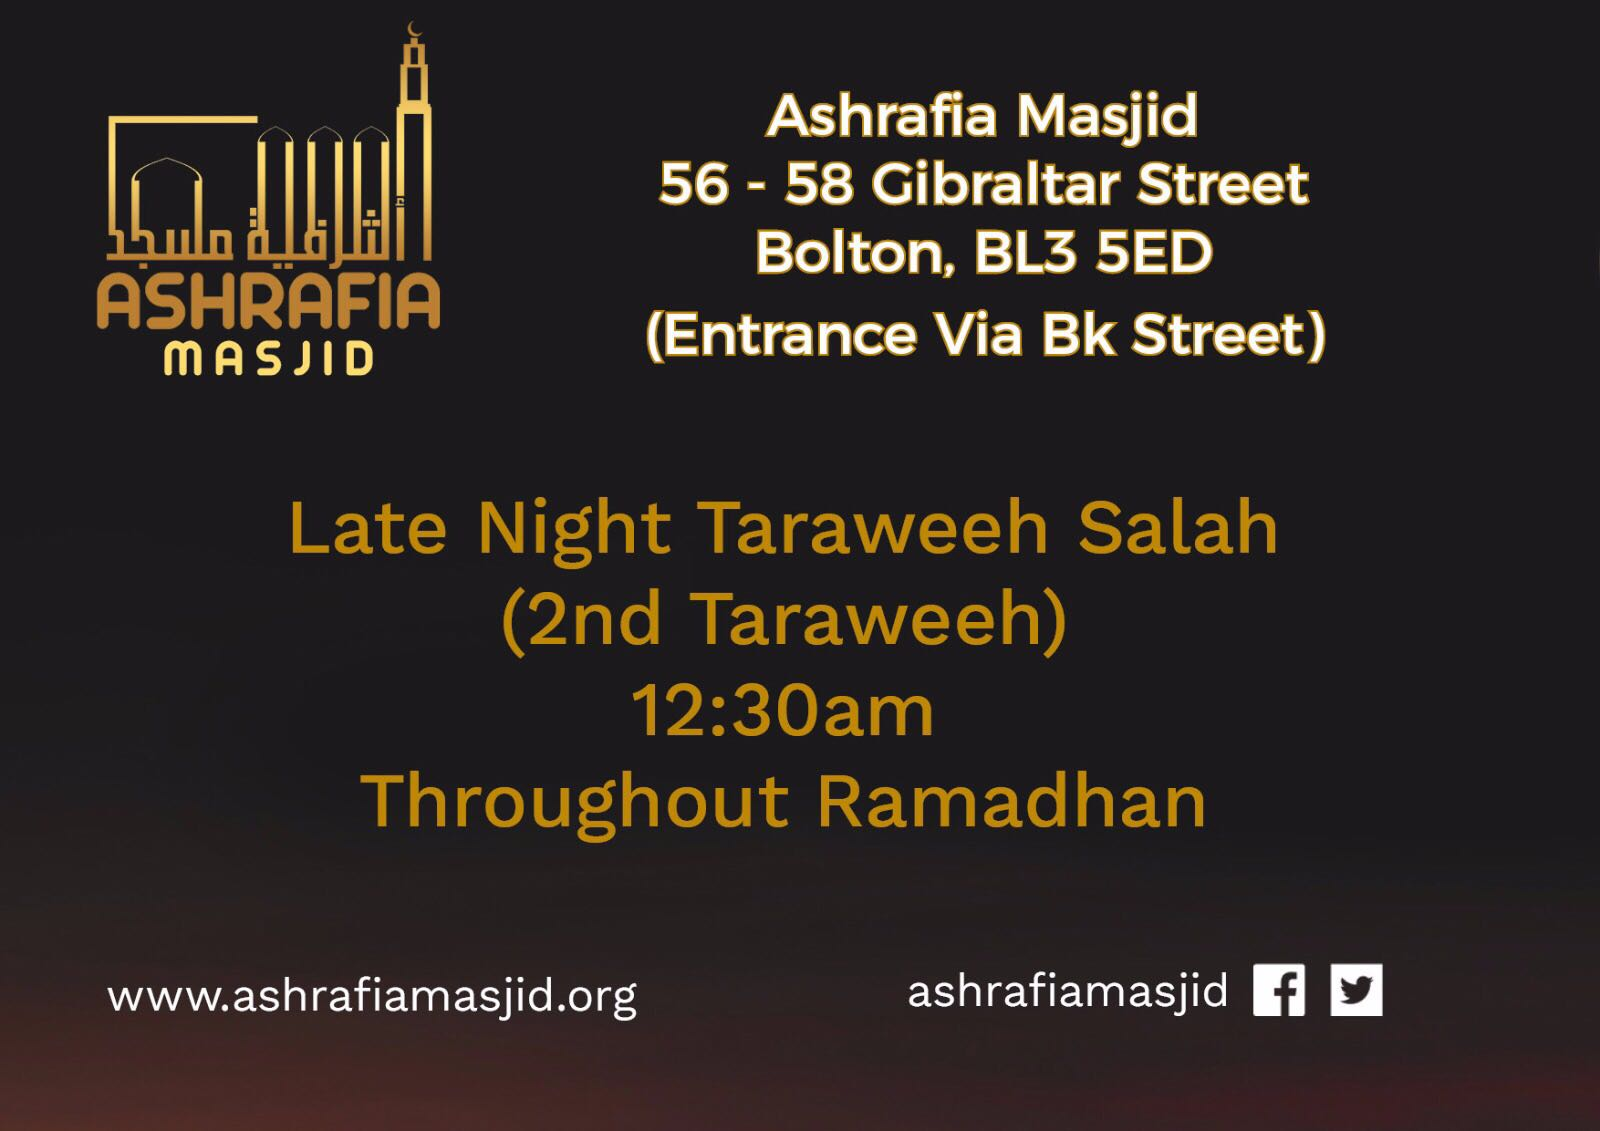 Ashrafia Masjid Late Night Taraweeh Ramadhan 2017